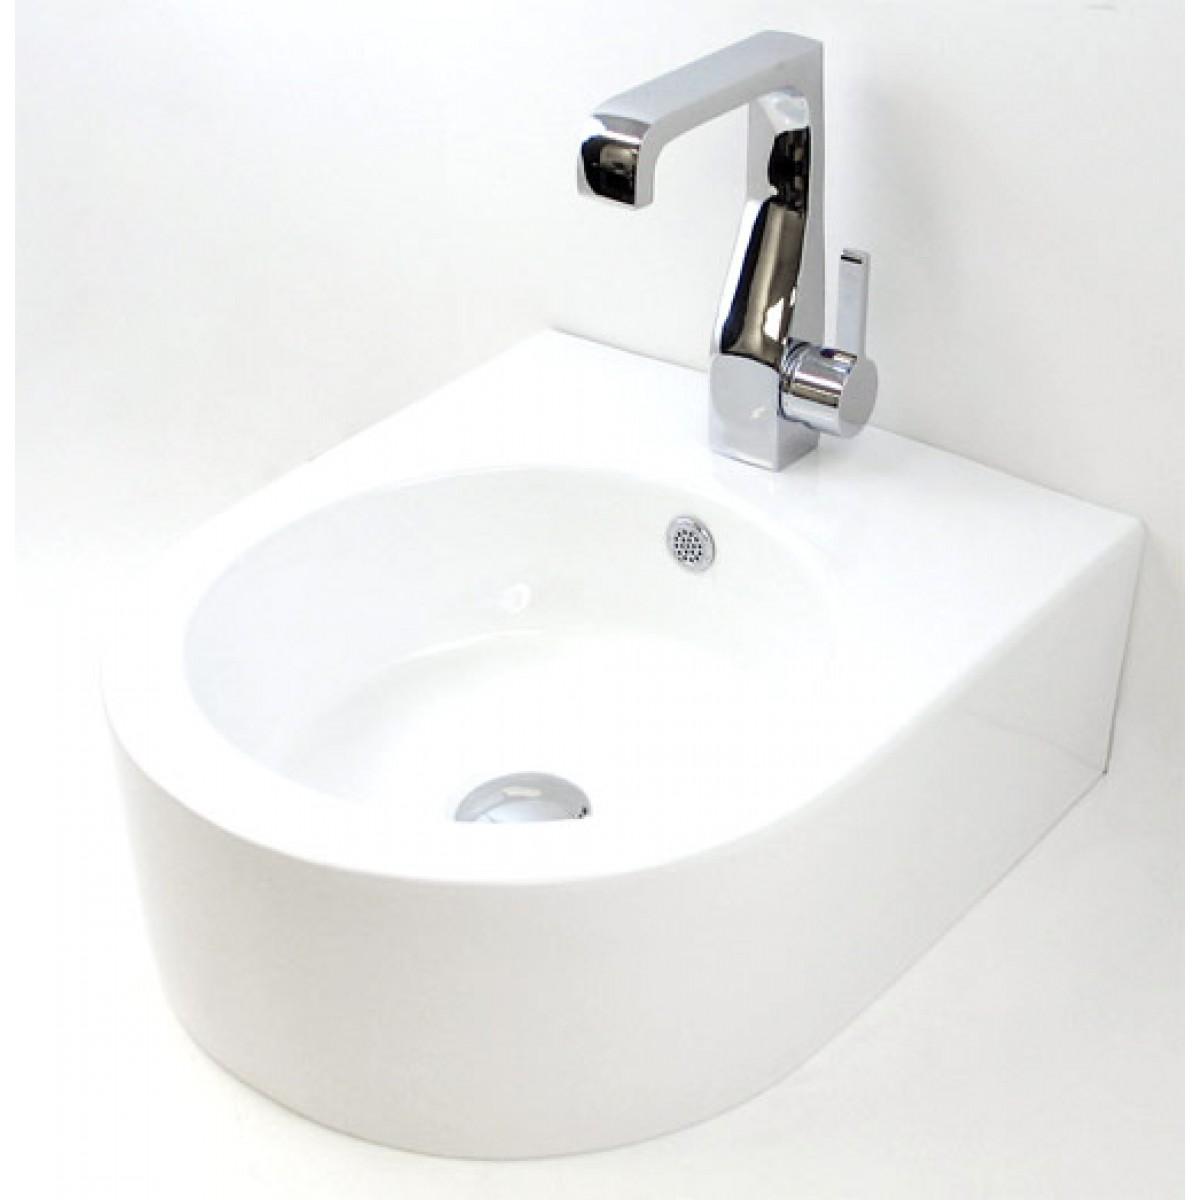 Porcelain Ceramic Single Hole Bathroom Sink